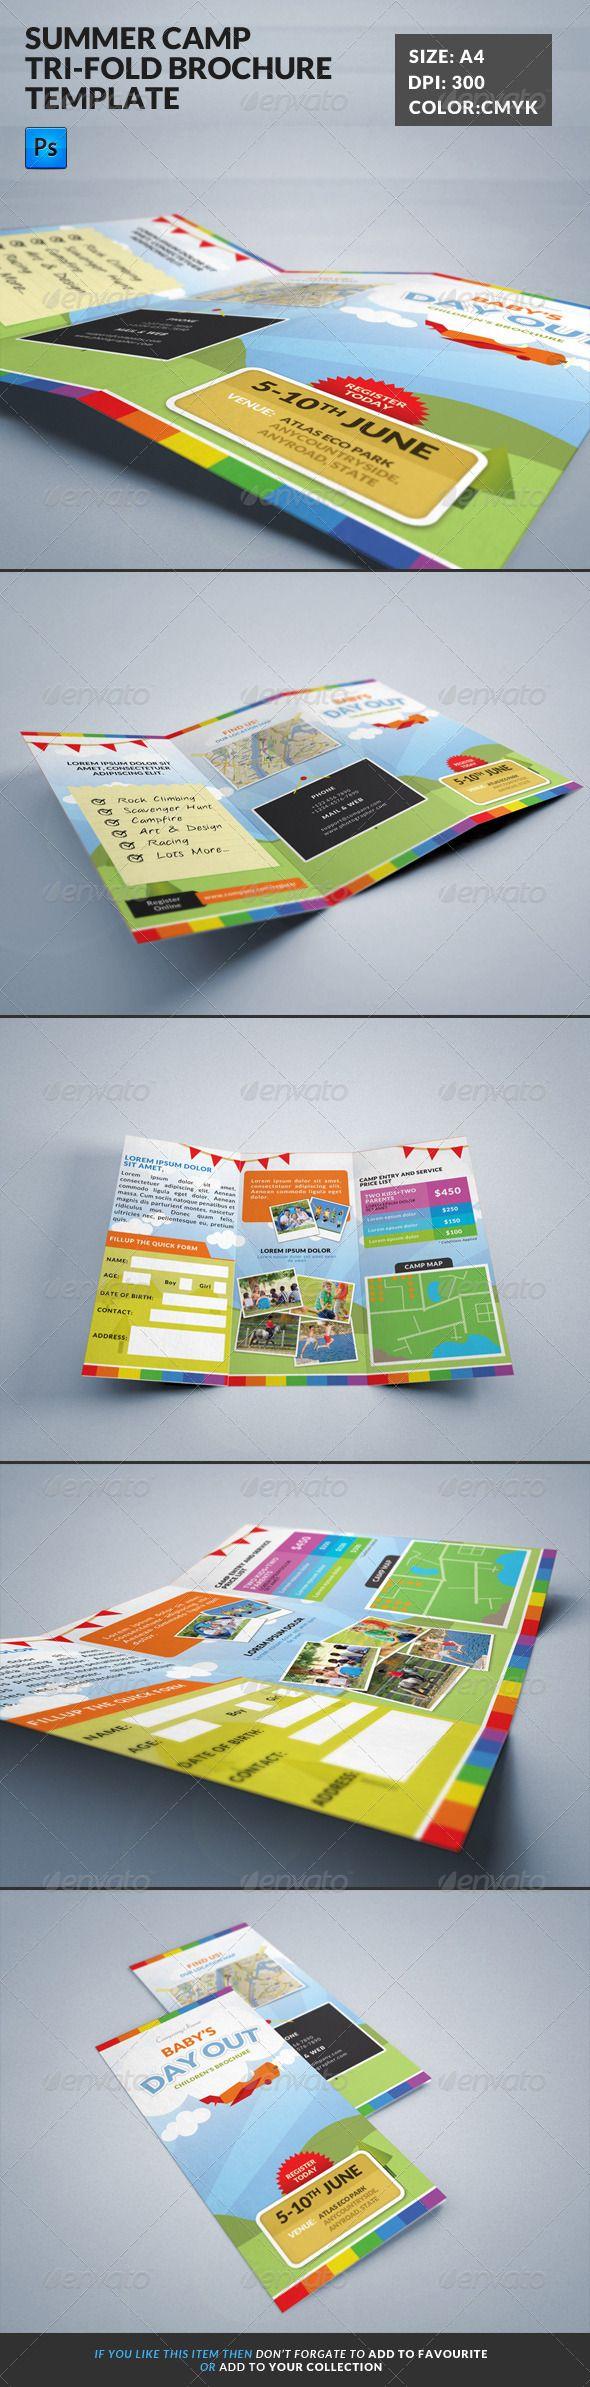 Summer Camp Kids Tri-Fold Brochure | Diseño editorial y Editorial